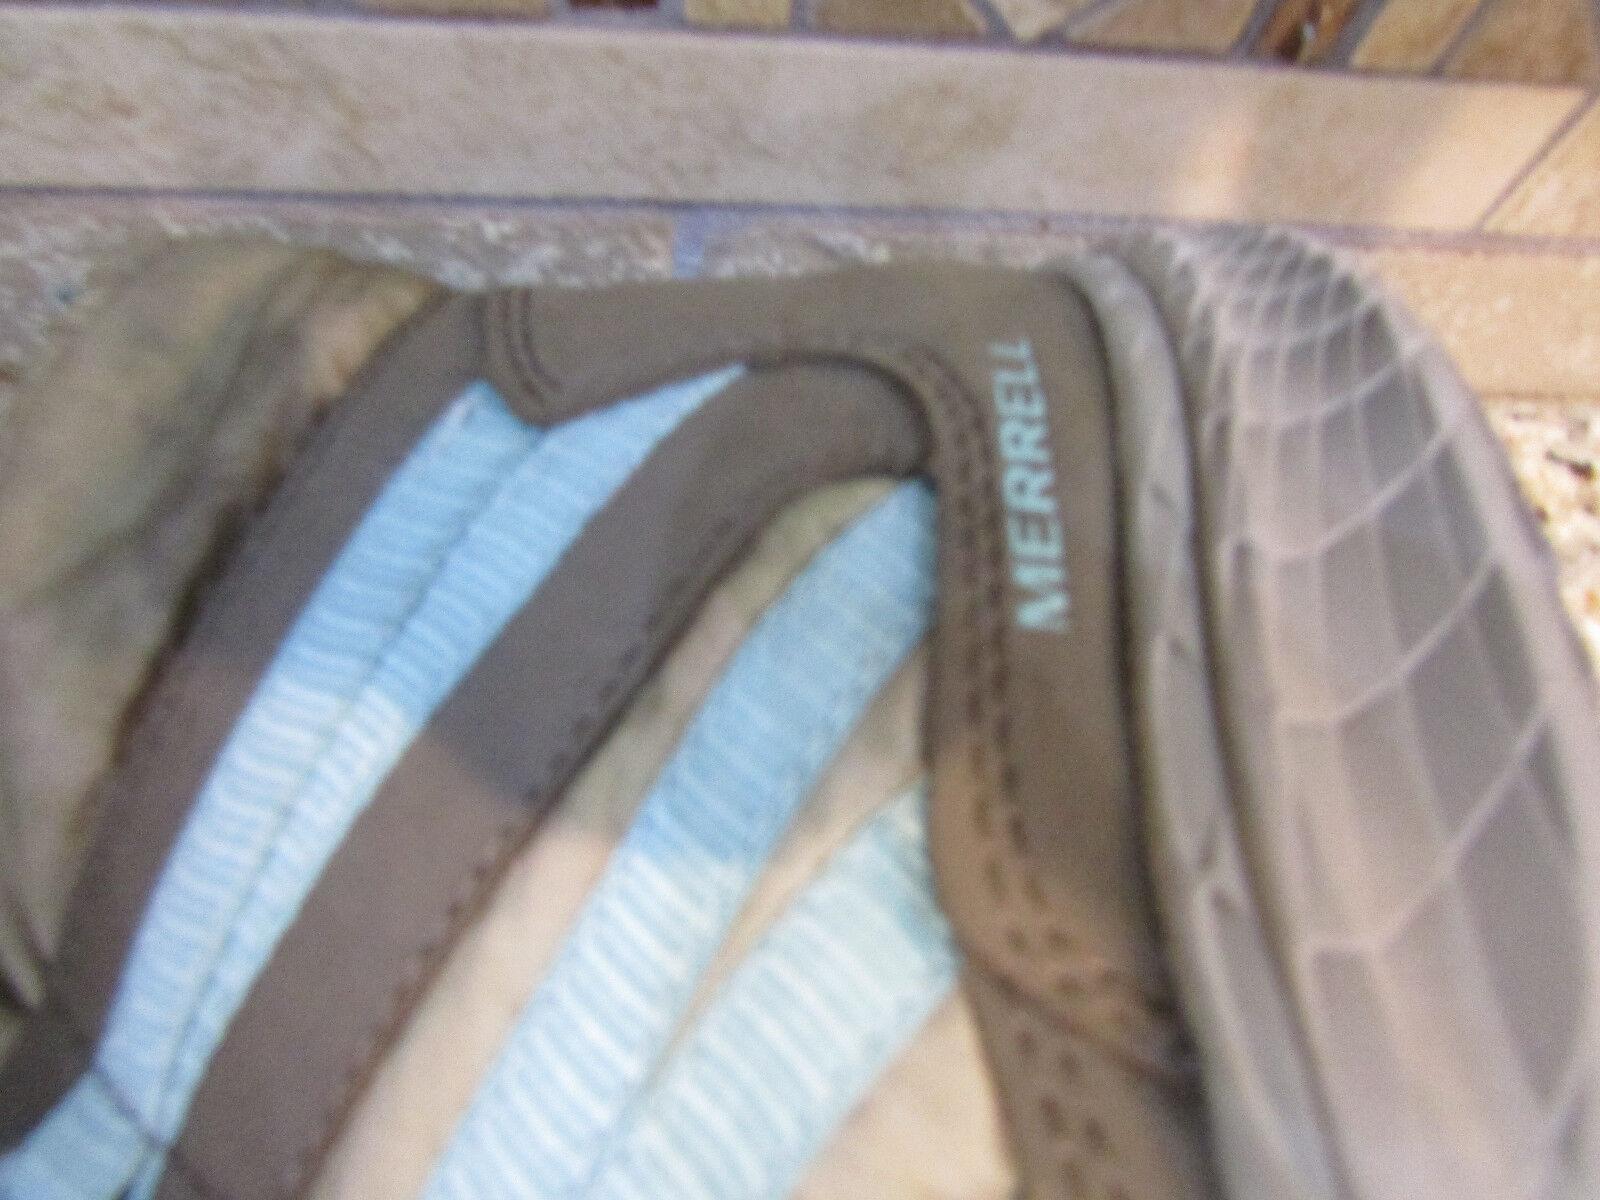 NEW Damenschuhe MERRELL PECHORA PULL Stiefel ANKLE Stiefel Damenschuhe NEW 9.5 TAUPE J42636 FLEECE LINED 048f69